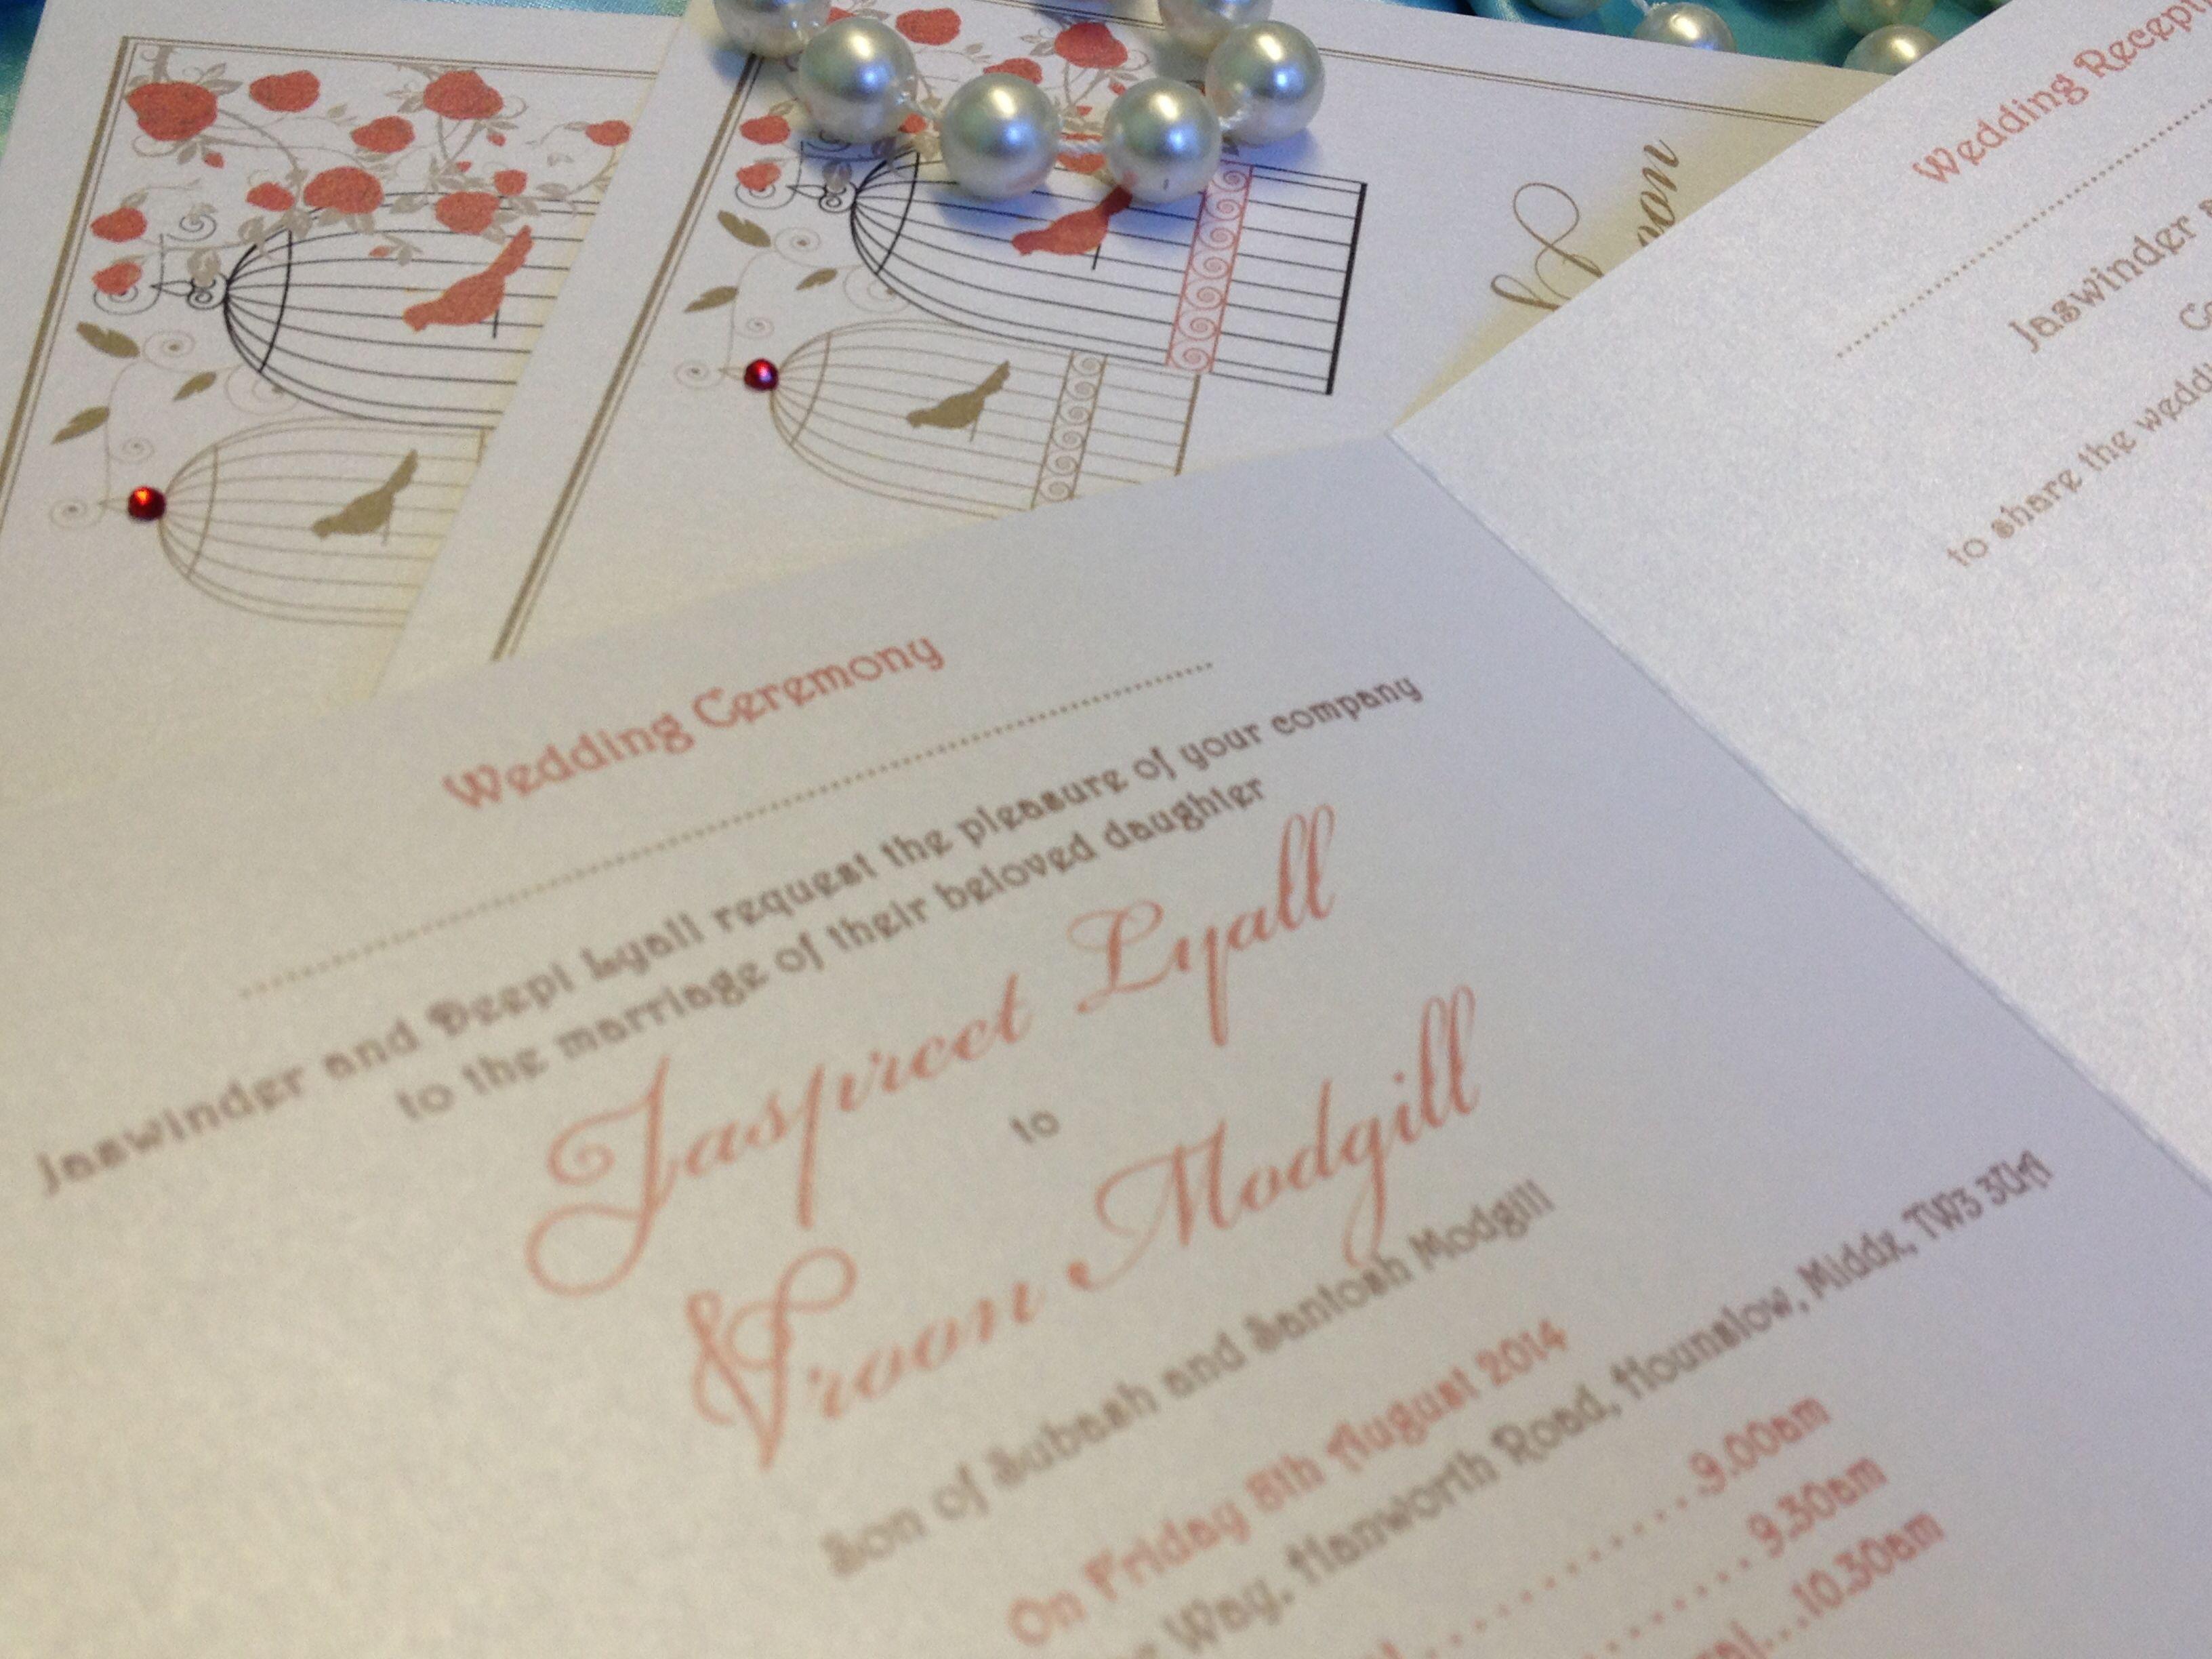 London Wedding Invitations Beautiful Bespoke Vintage Folded Card With Adorable Birdcage Des Wedding Stationery Wedding Invitations Bespoke Wedding Stationery